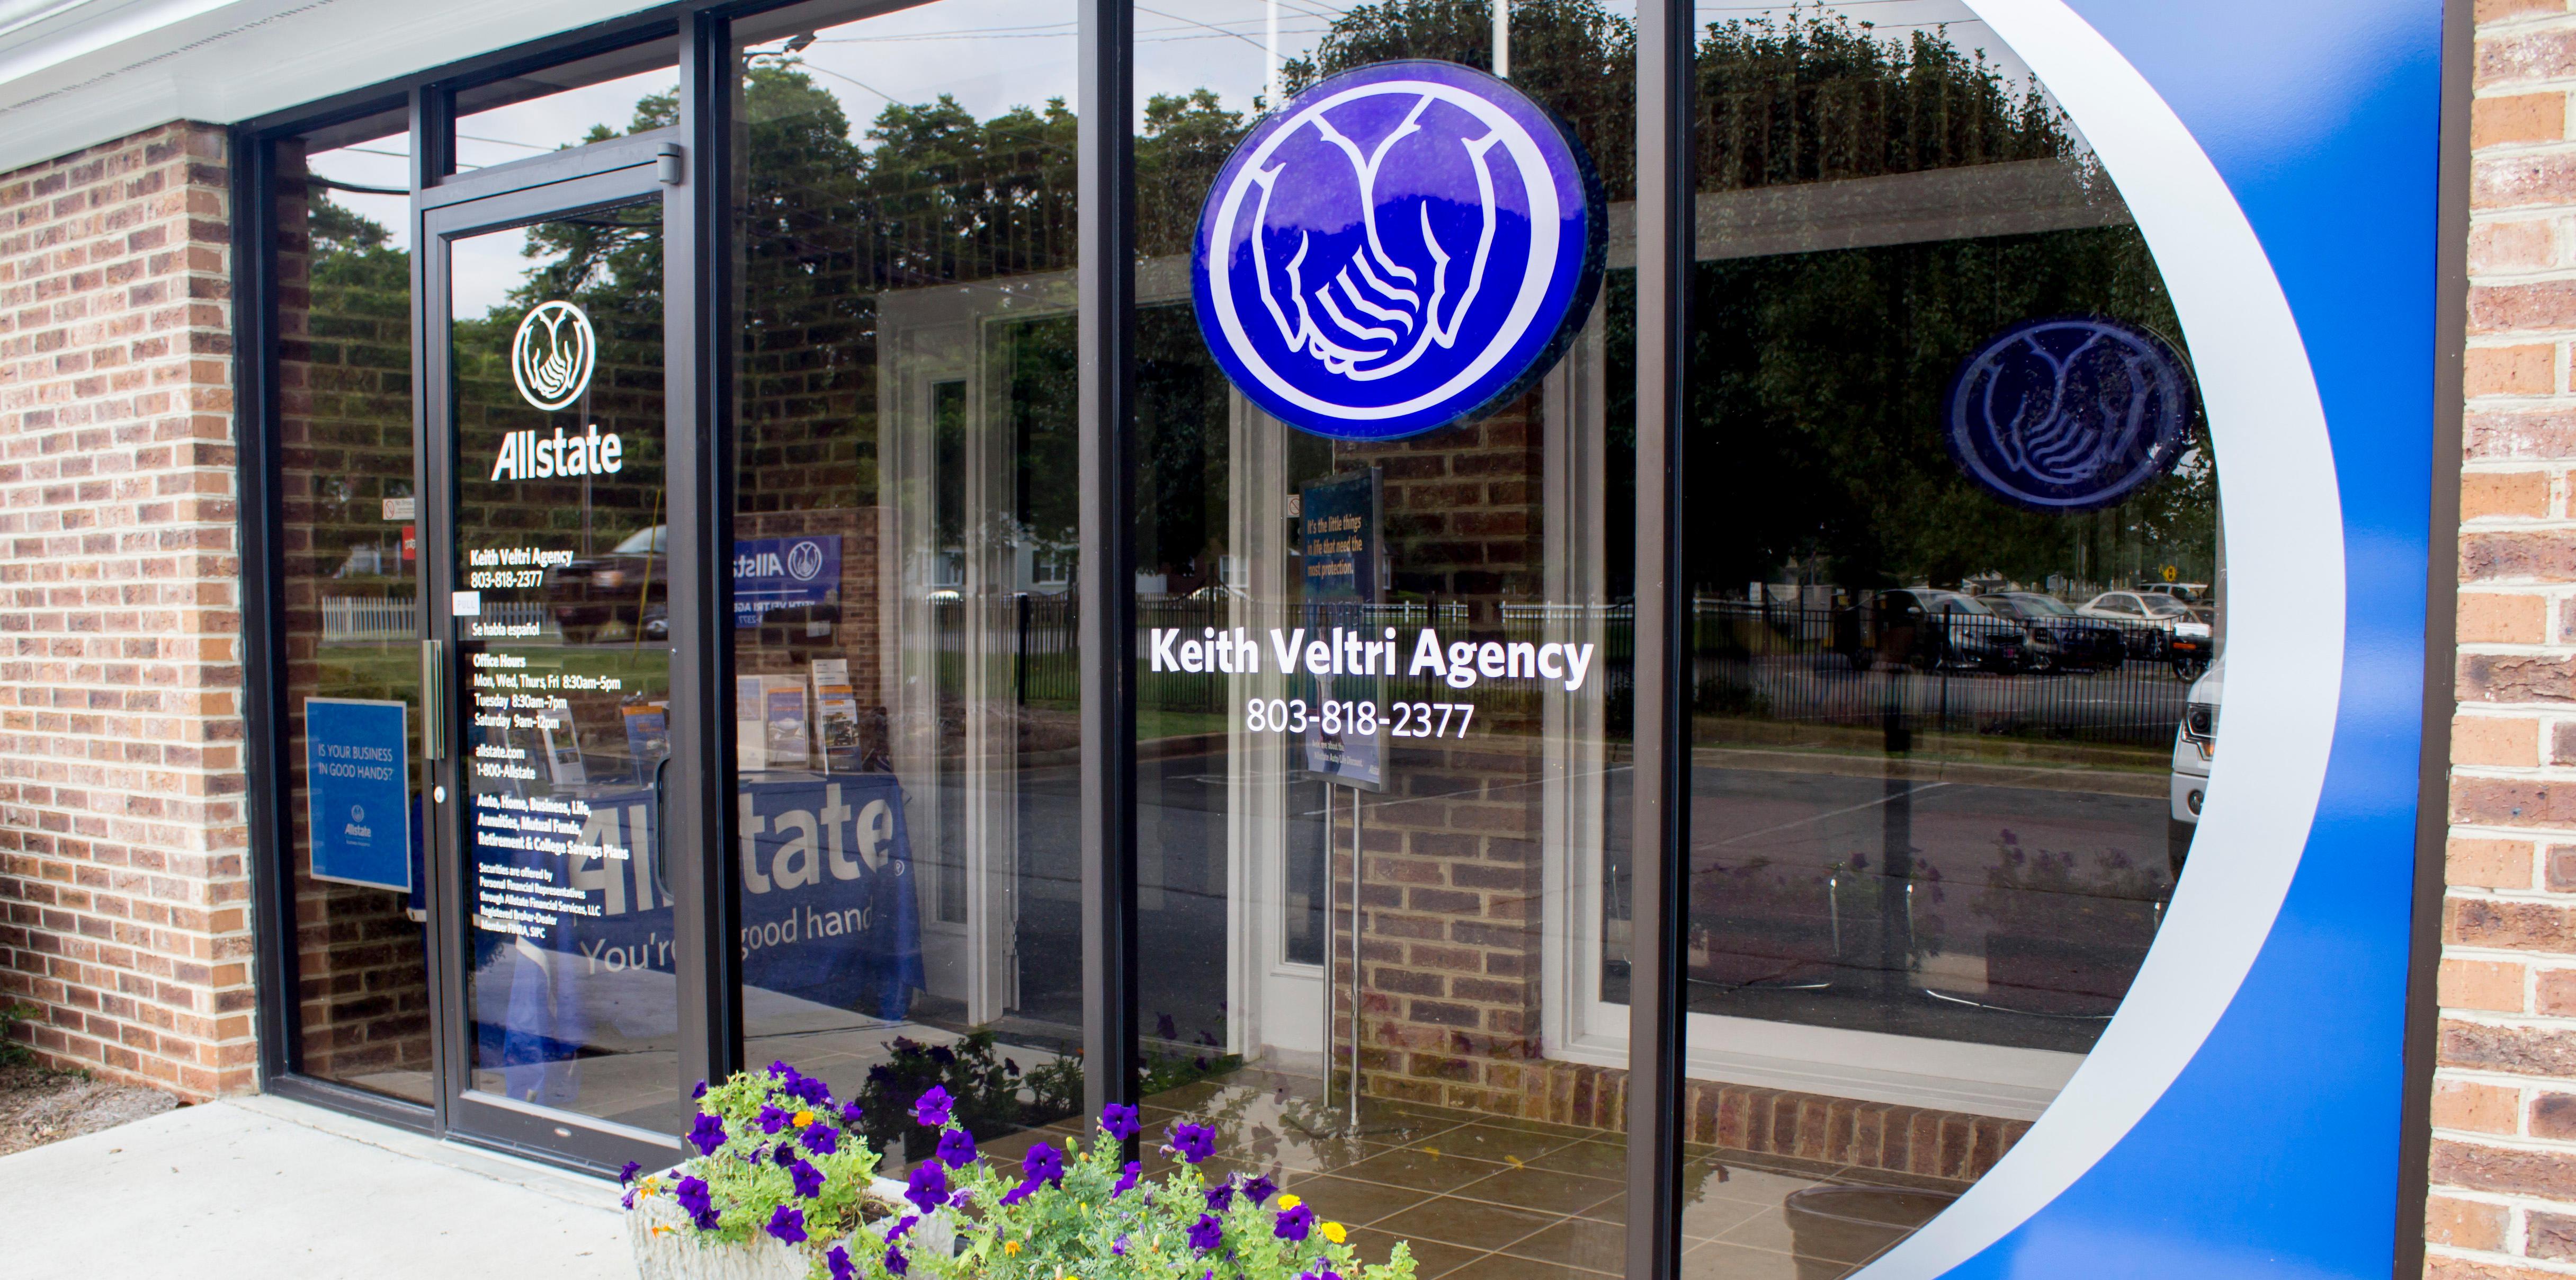 Keith Veltri: Allstate Insurance Photo